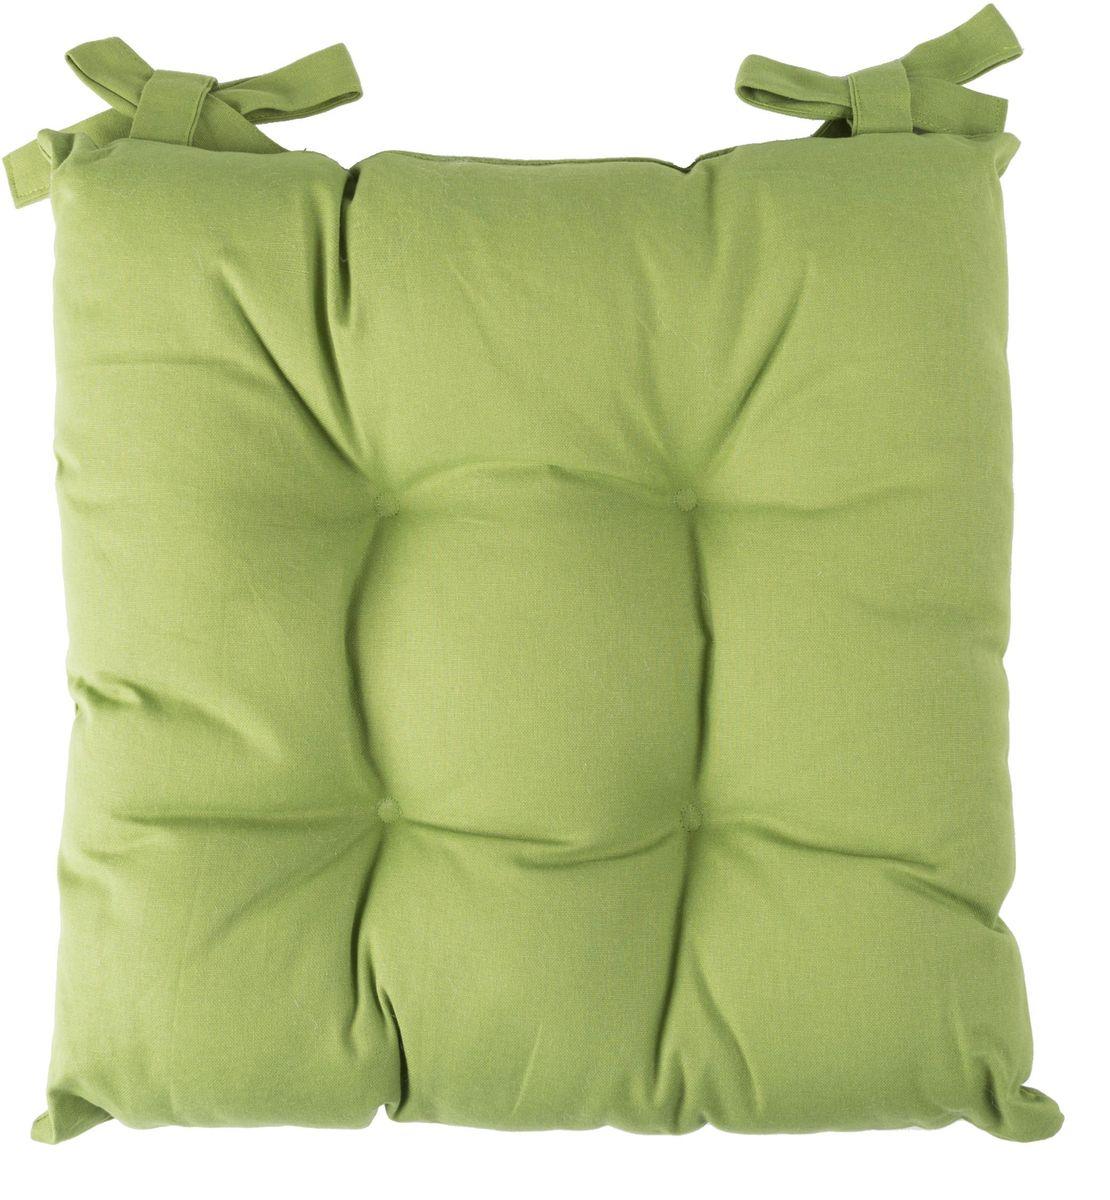 Подушка на стул Daily by T Каролина, цвет: салатовый, 45 х 45 см матрас подушка на подоконник daily home